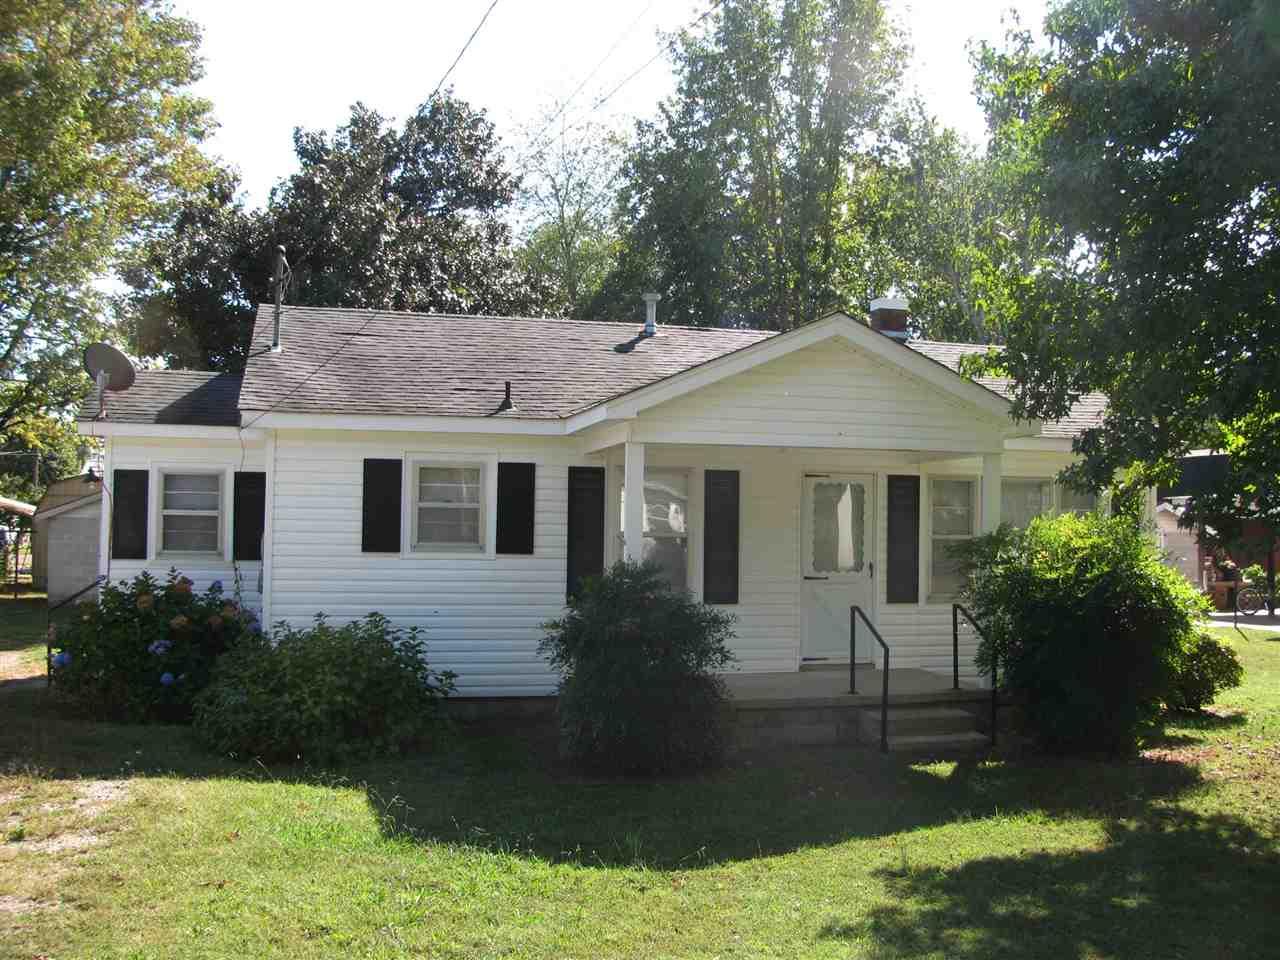 70 Park Savannah, TN 38372 - MLS #: 10013216